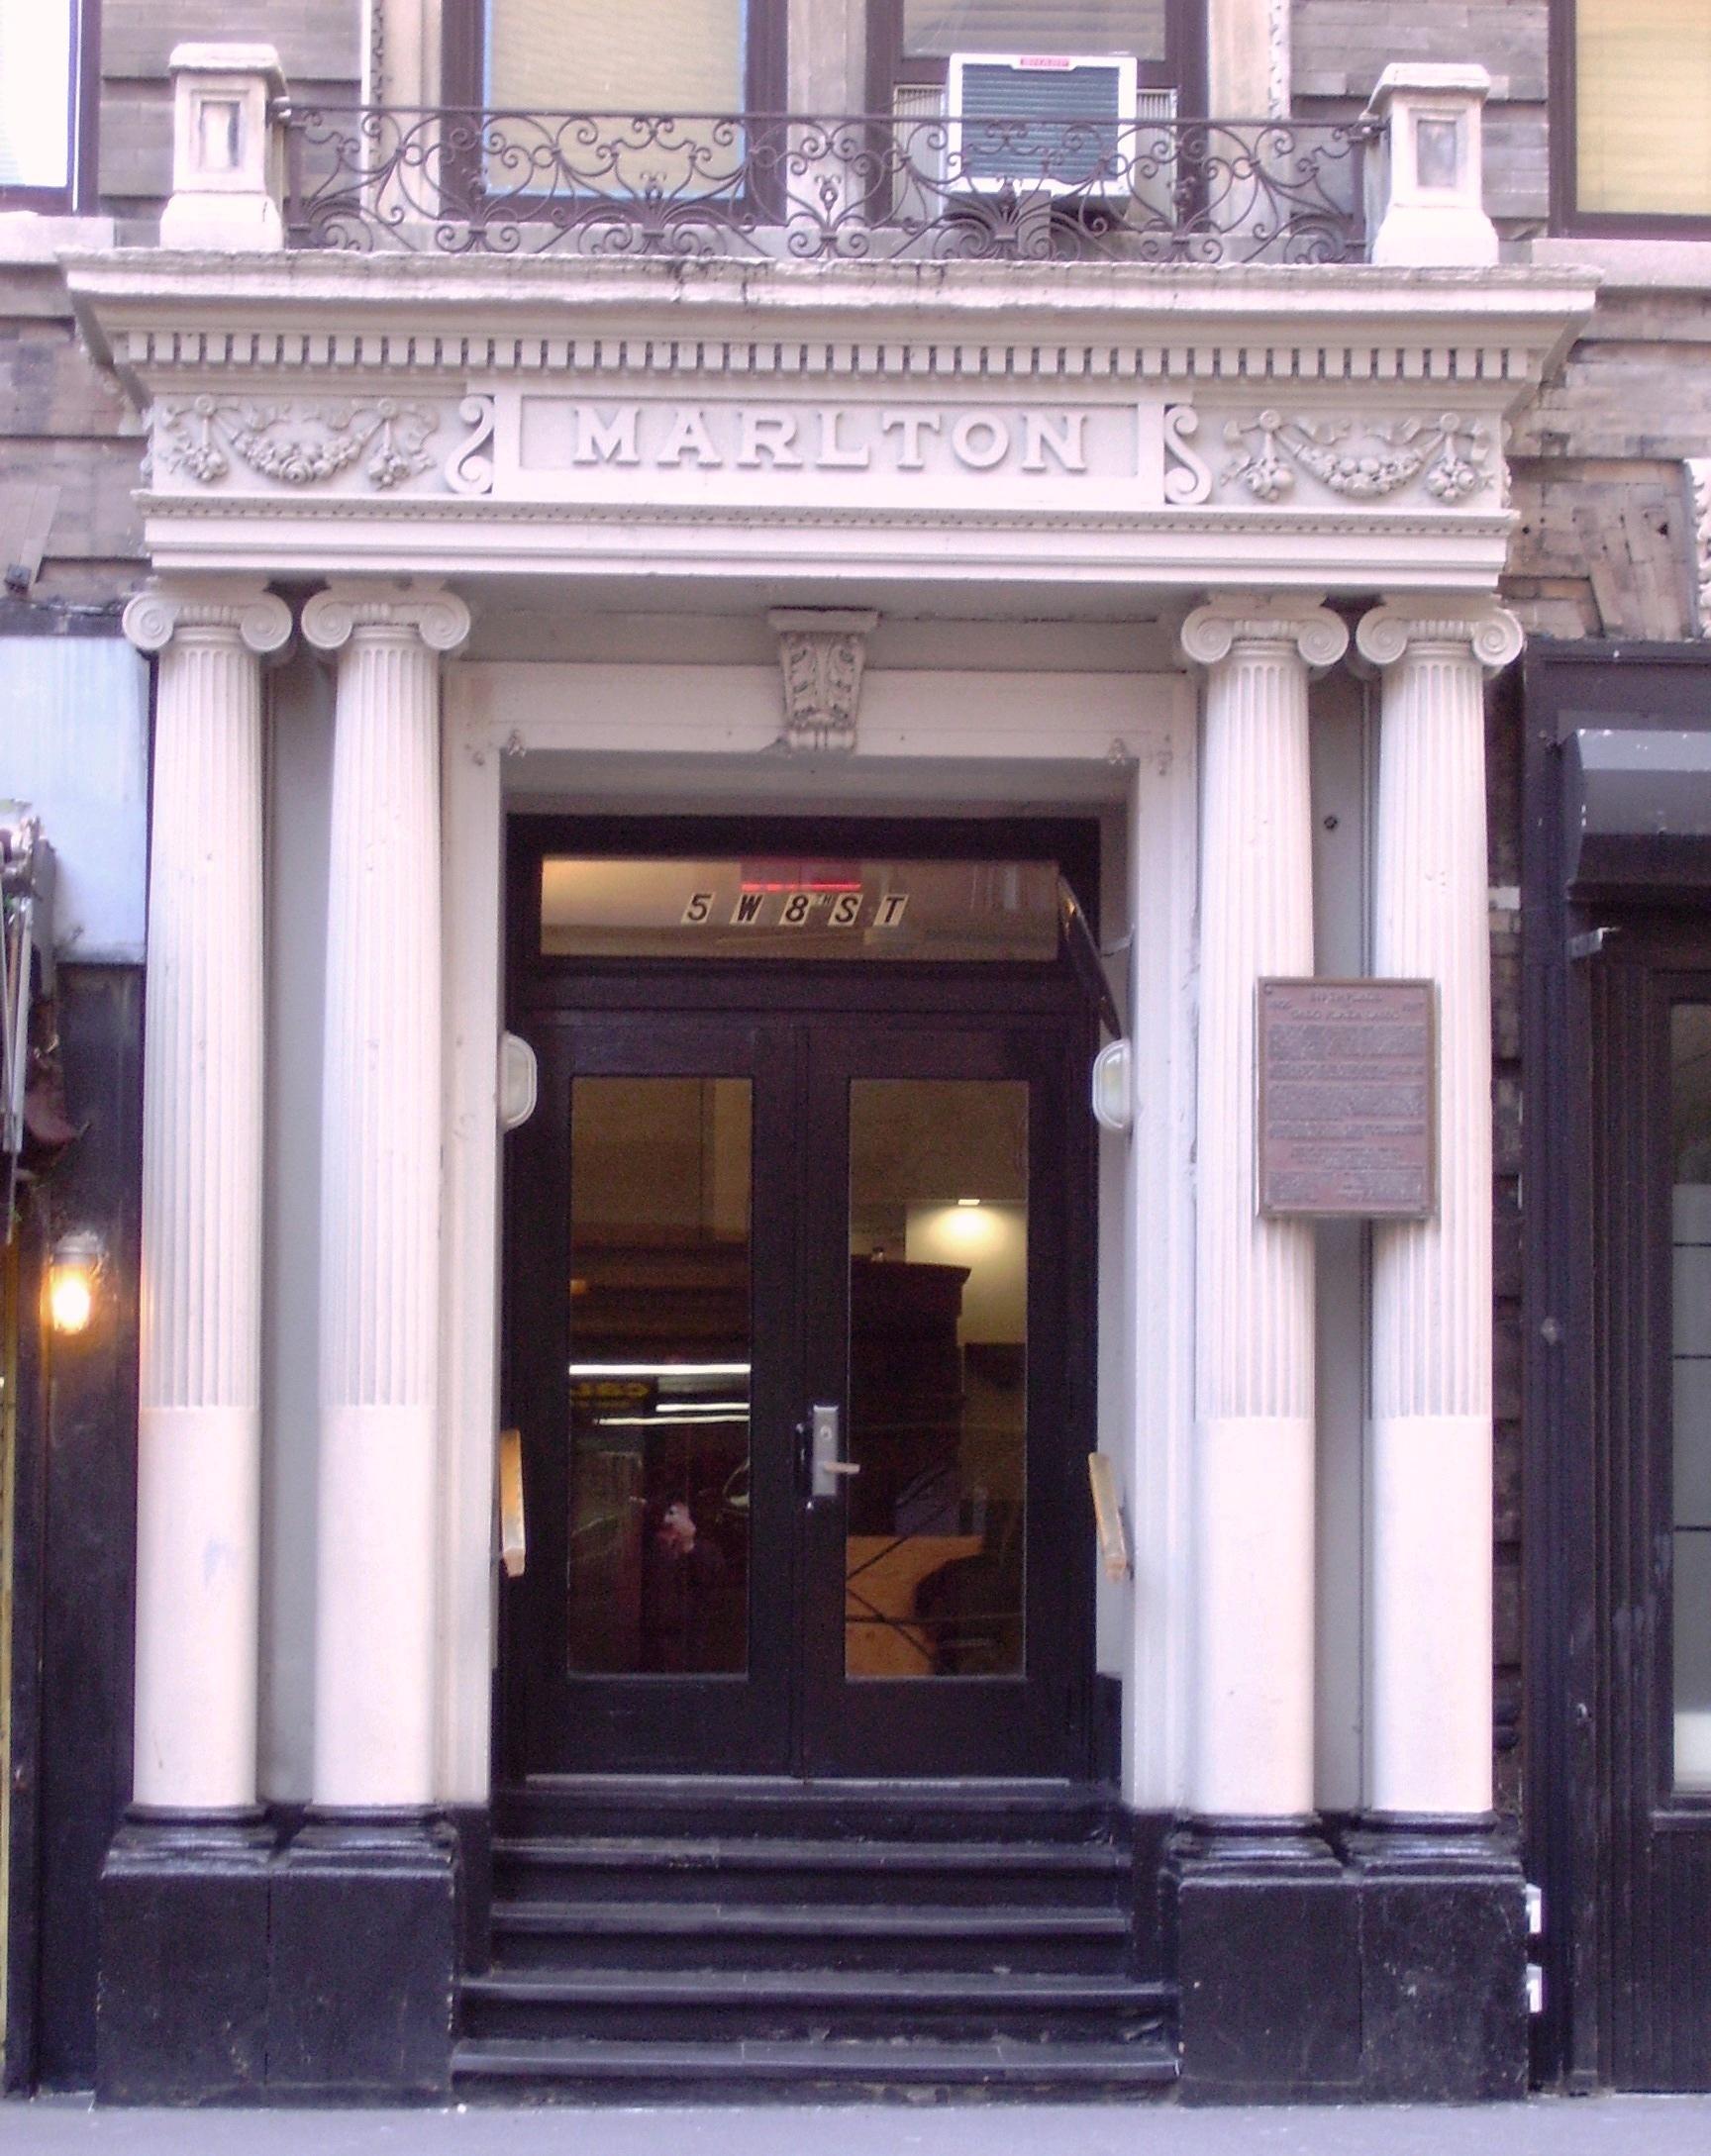 File:Marlton House entrance.jpg - Wikimedia Commons